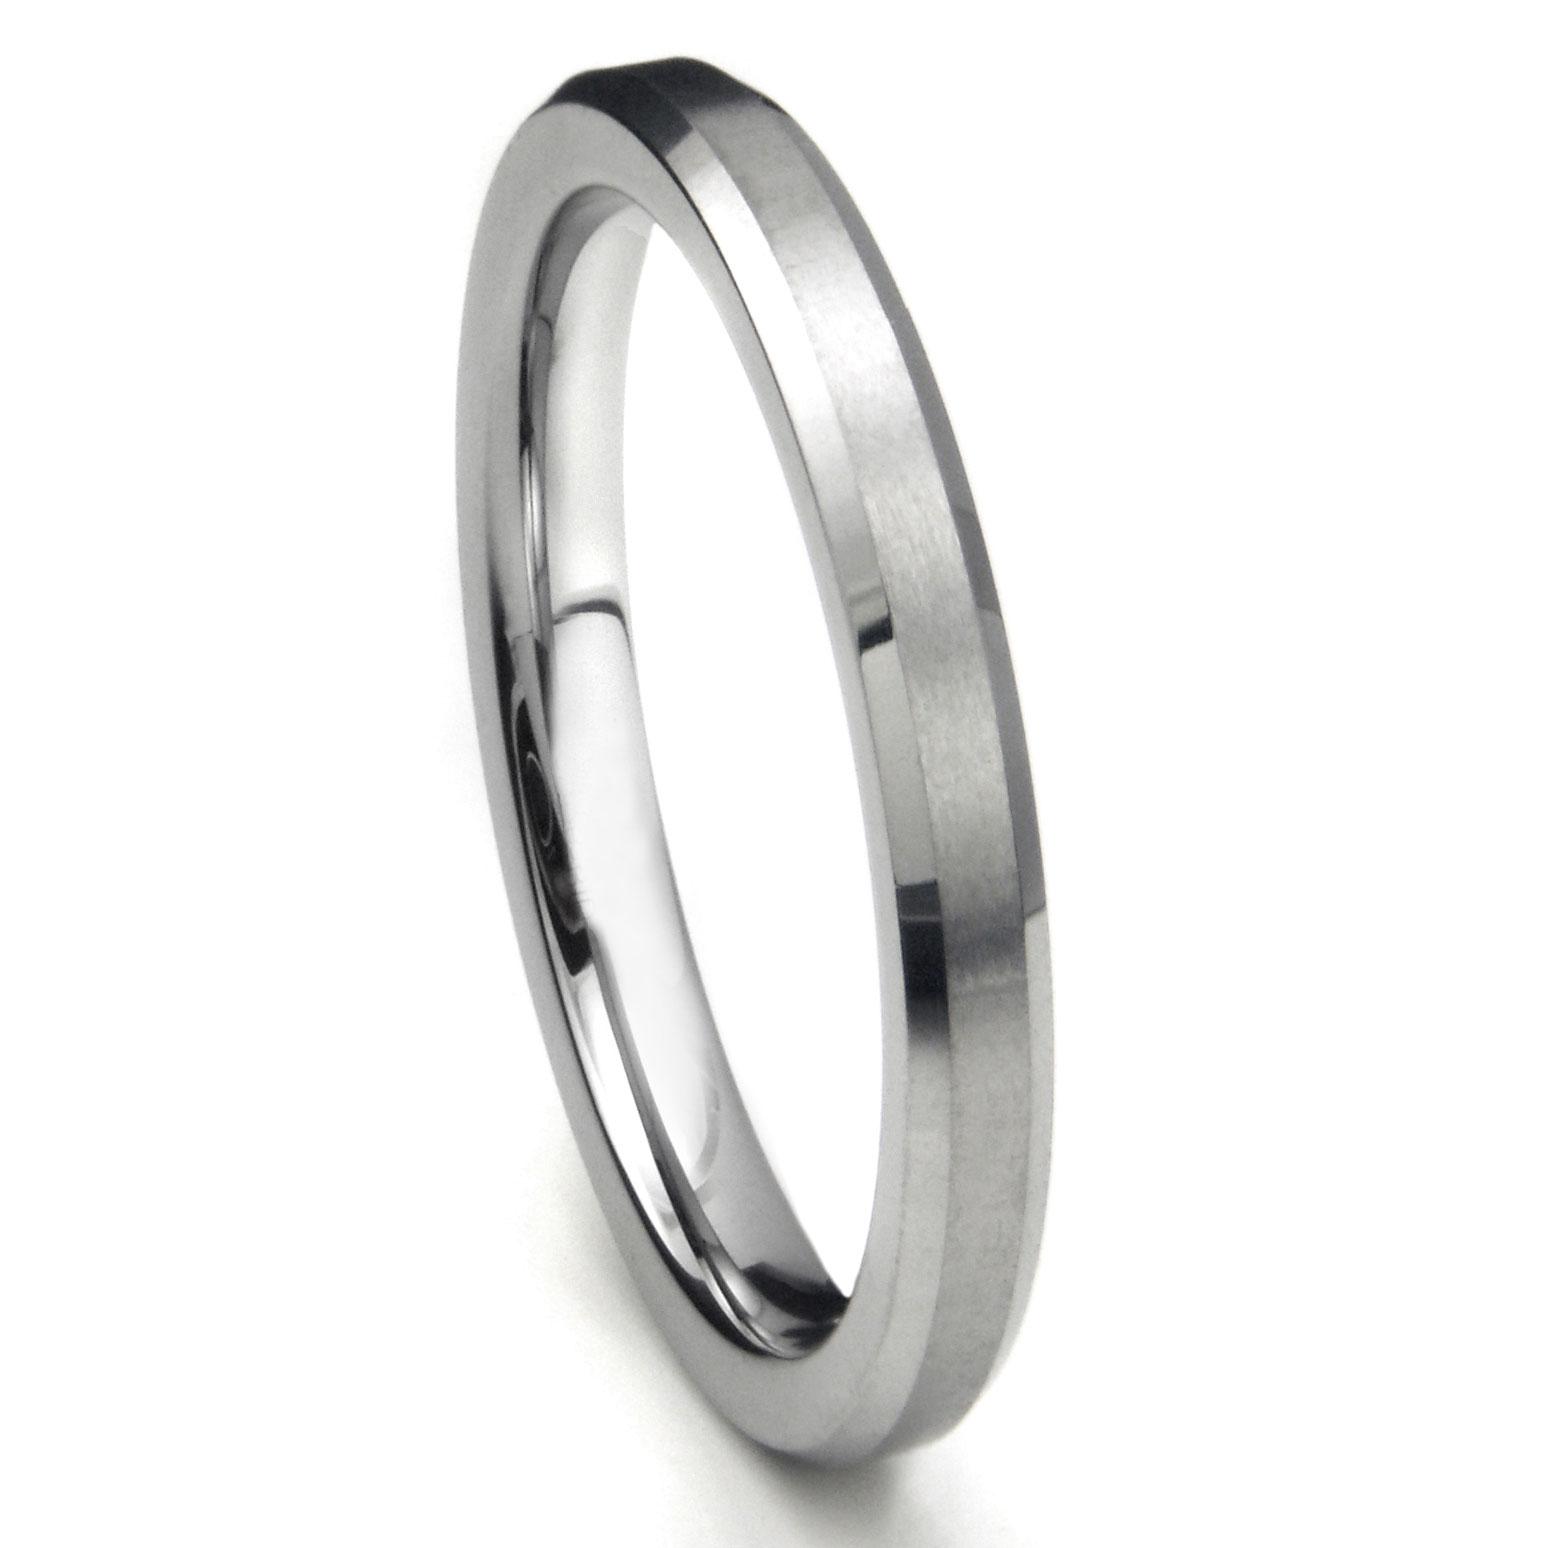 You May Also Like Black Tungsten Carbide Wedding Band: Gunmetal Thin Wedding Band At Reisefeber.org